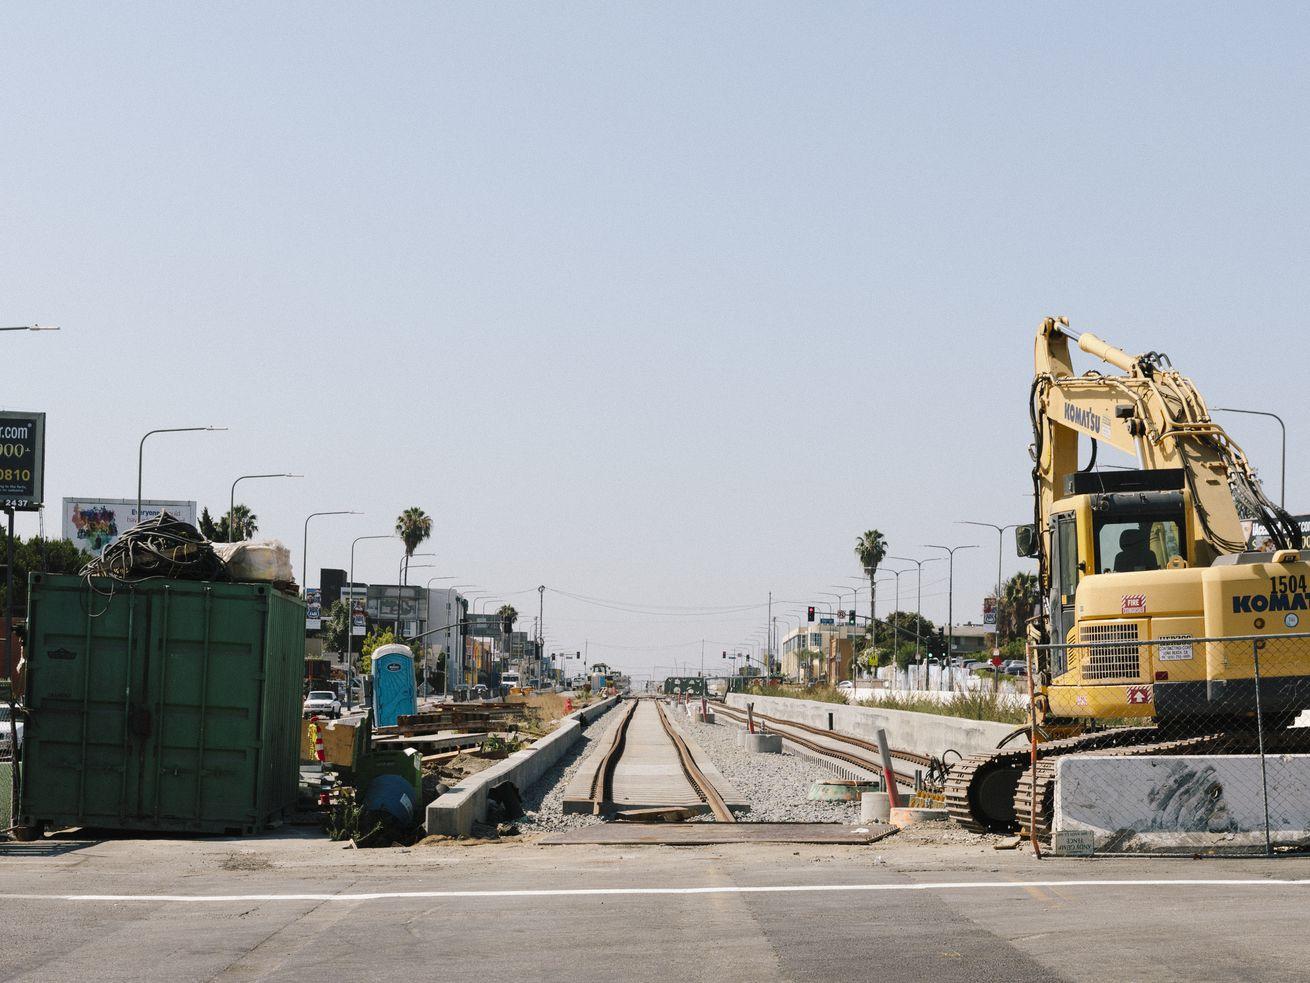 Tracks for the Crenshaw Line on Crenshaw Boulevard.